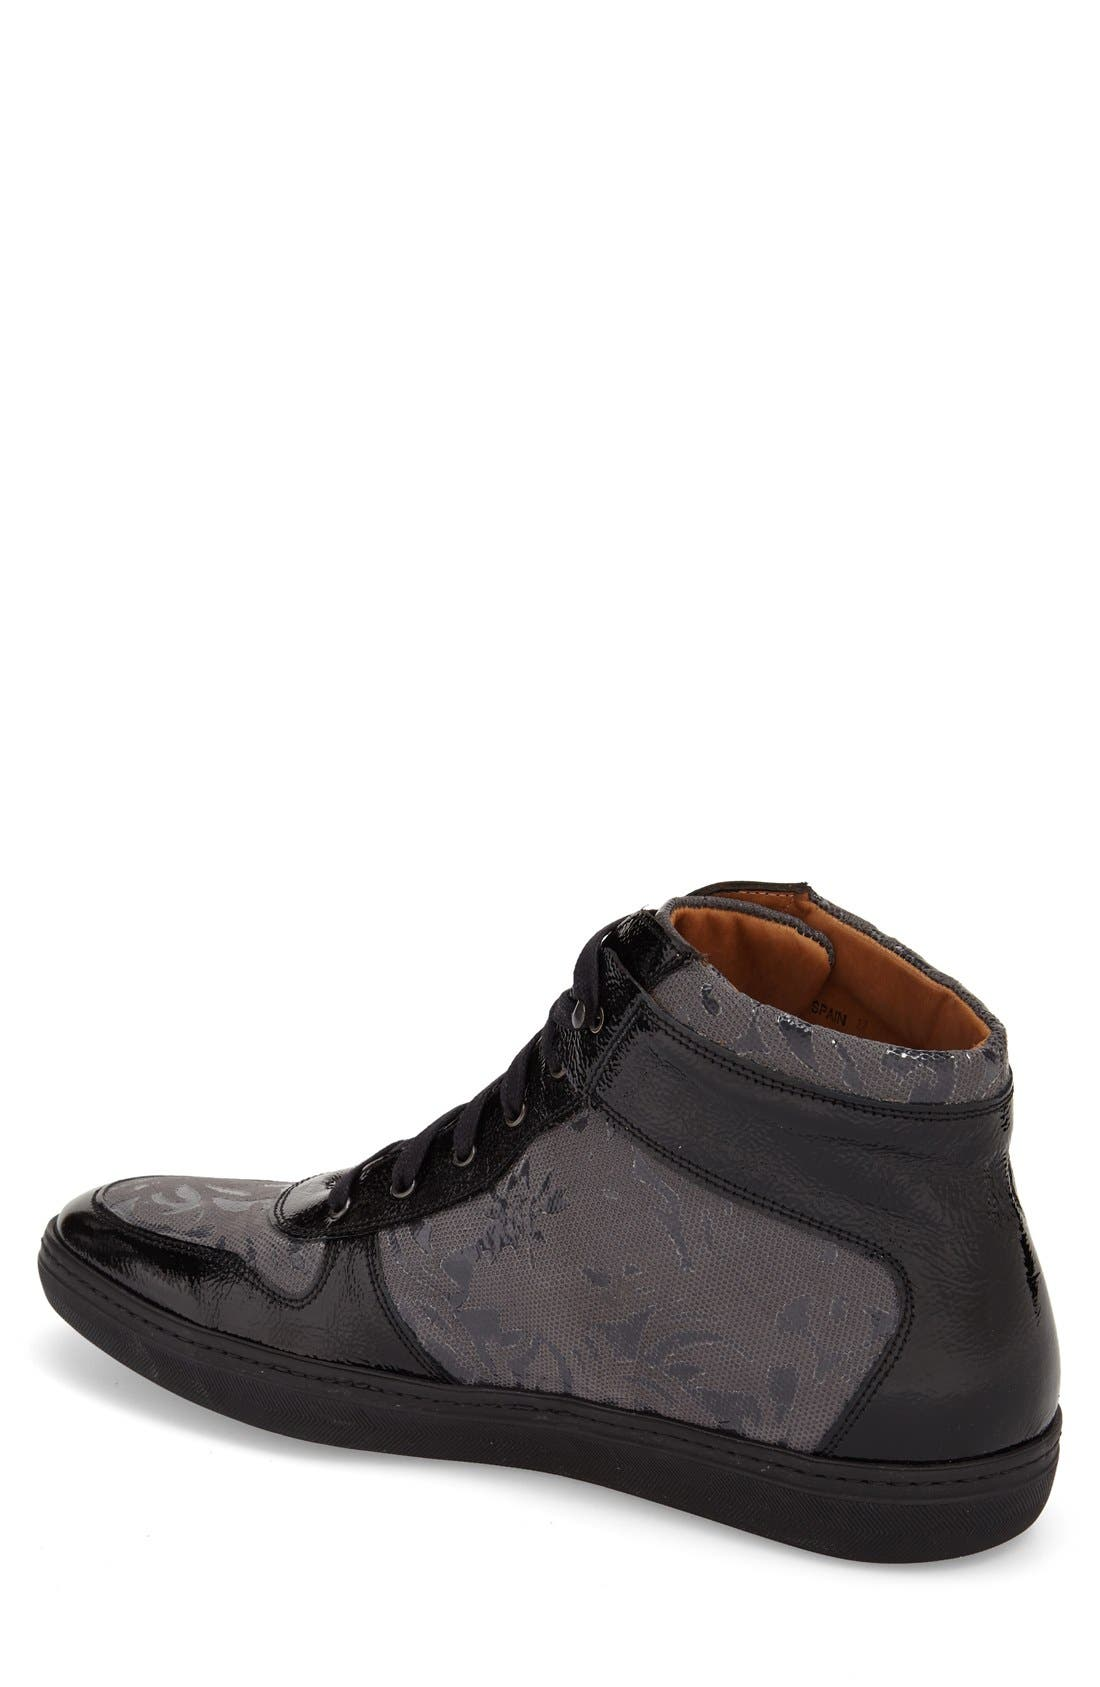 'Andorra' Sneaker,                             Alternate thumbnail 3, color,                             016